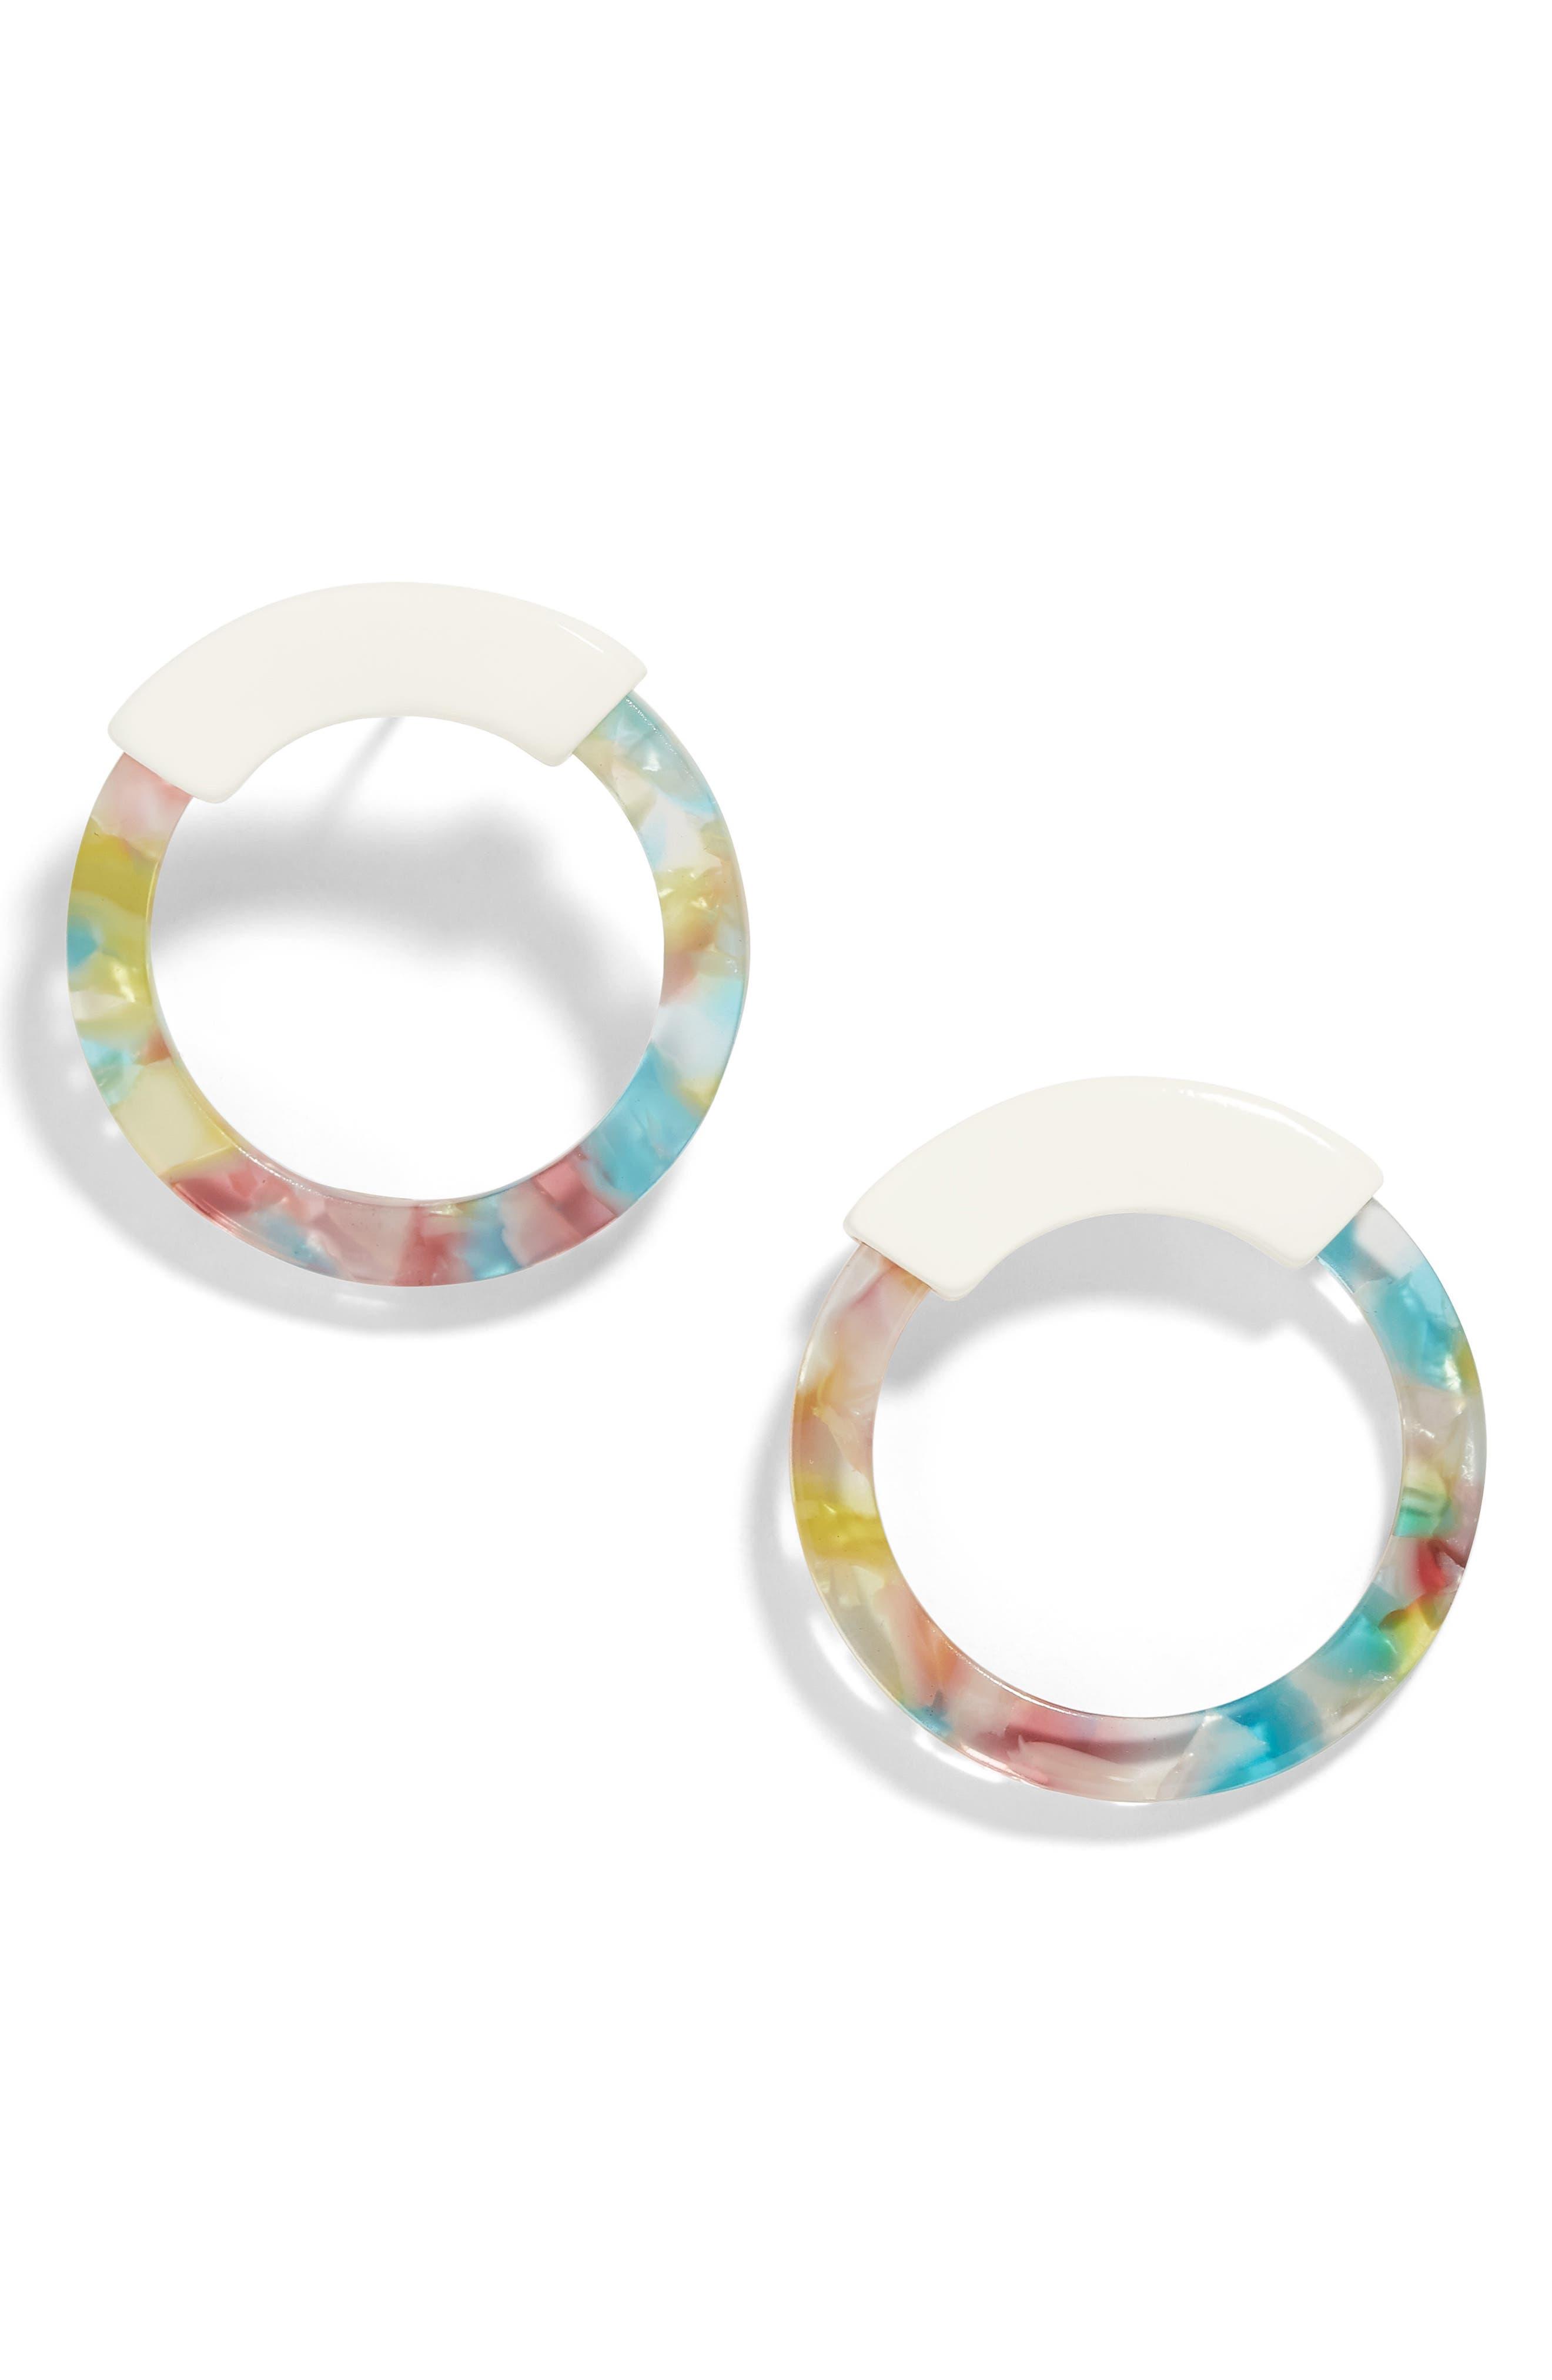 DeAnn Resin Hoop Earrings,                             Main thumbnail 1, color,                             MULTI